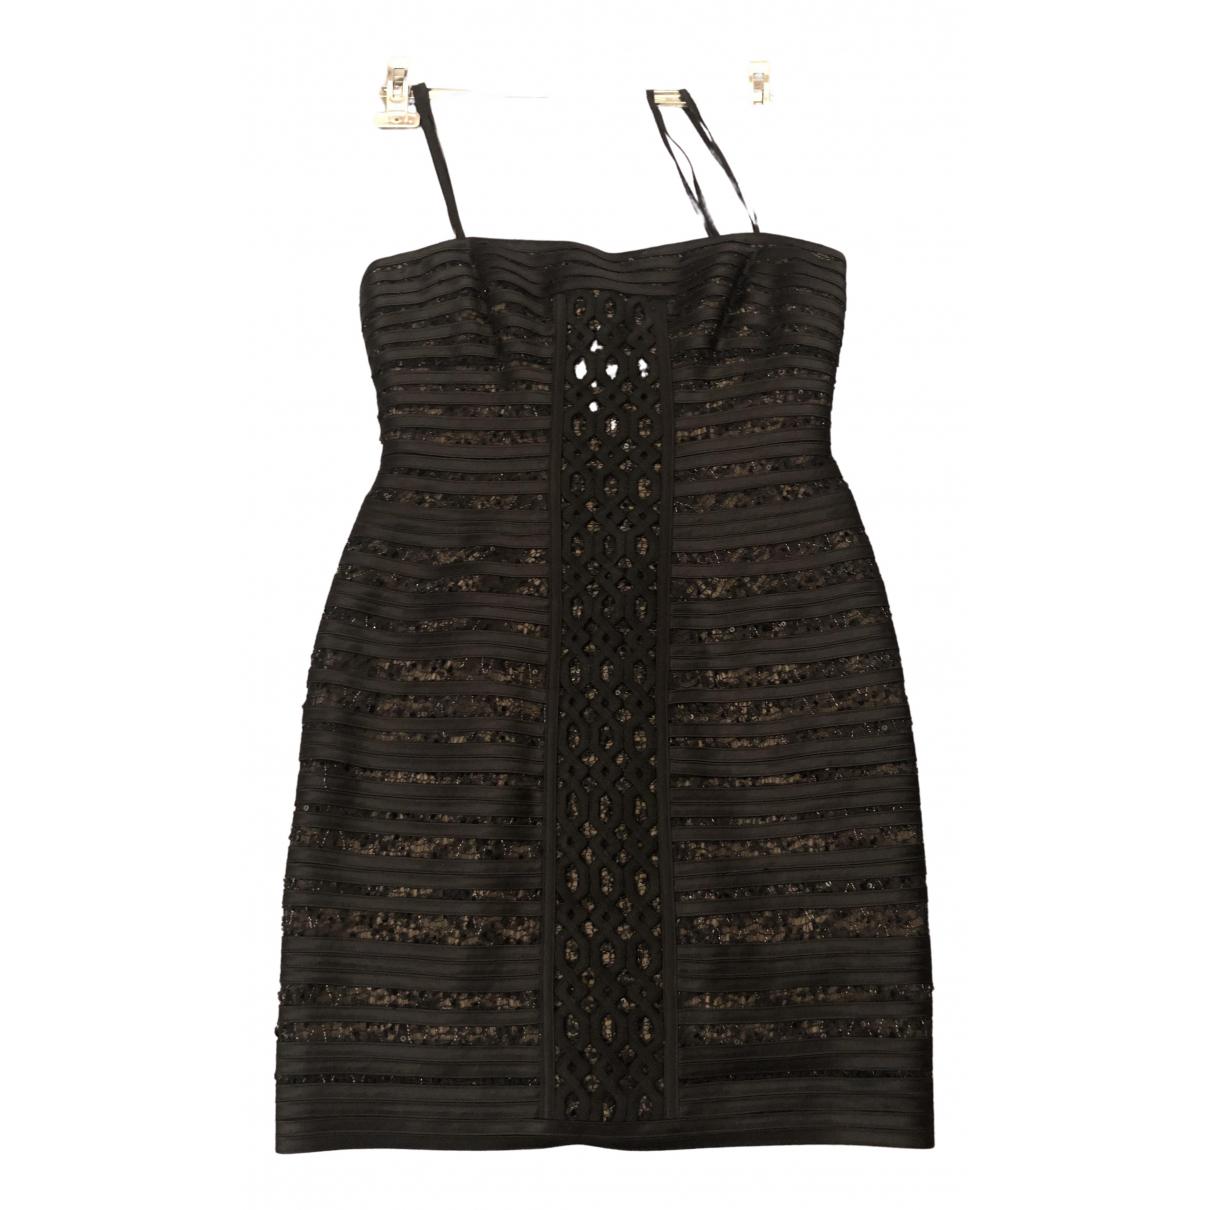 Bcbg Max Azria N Black dress for Women 6 US